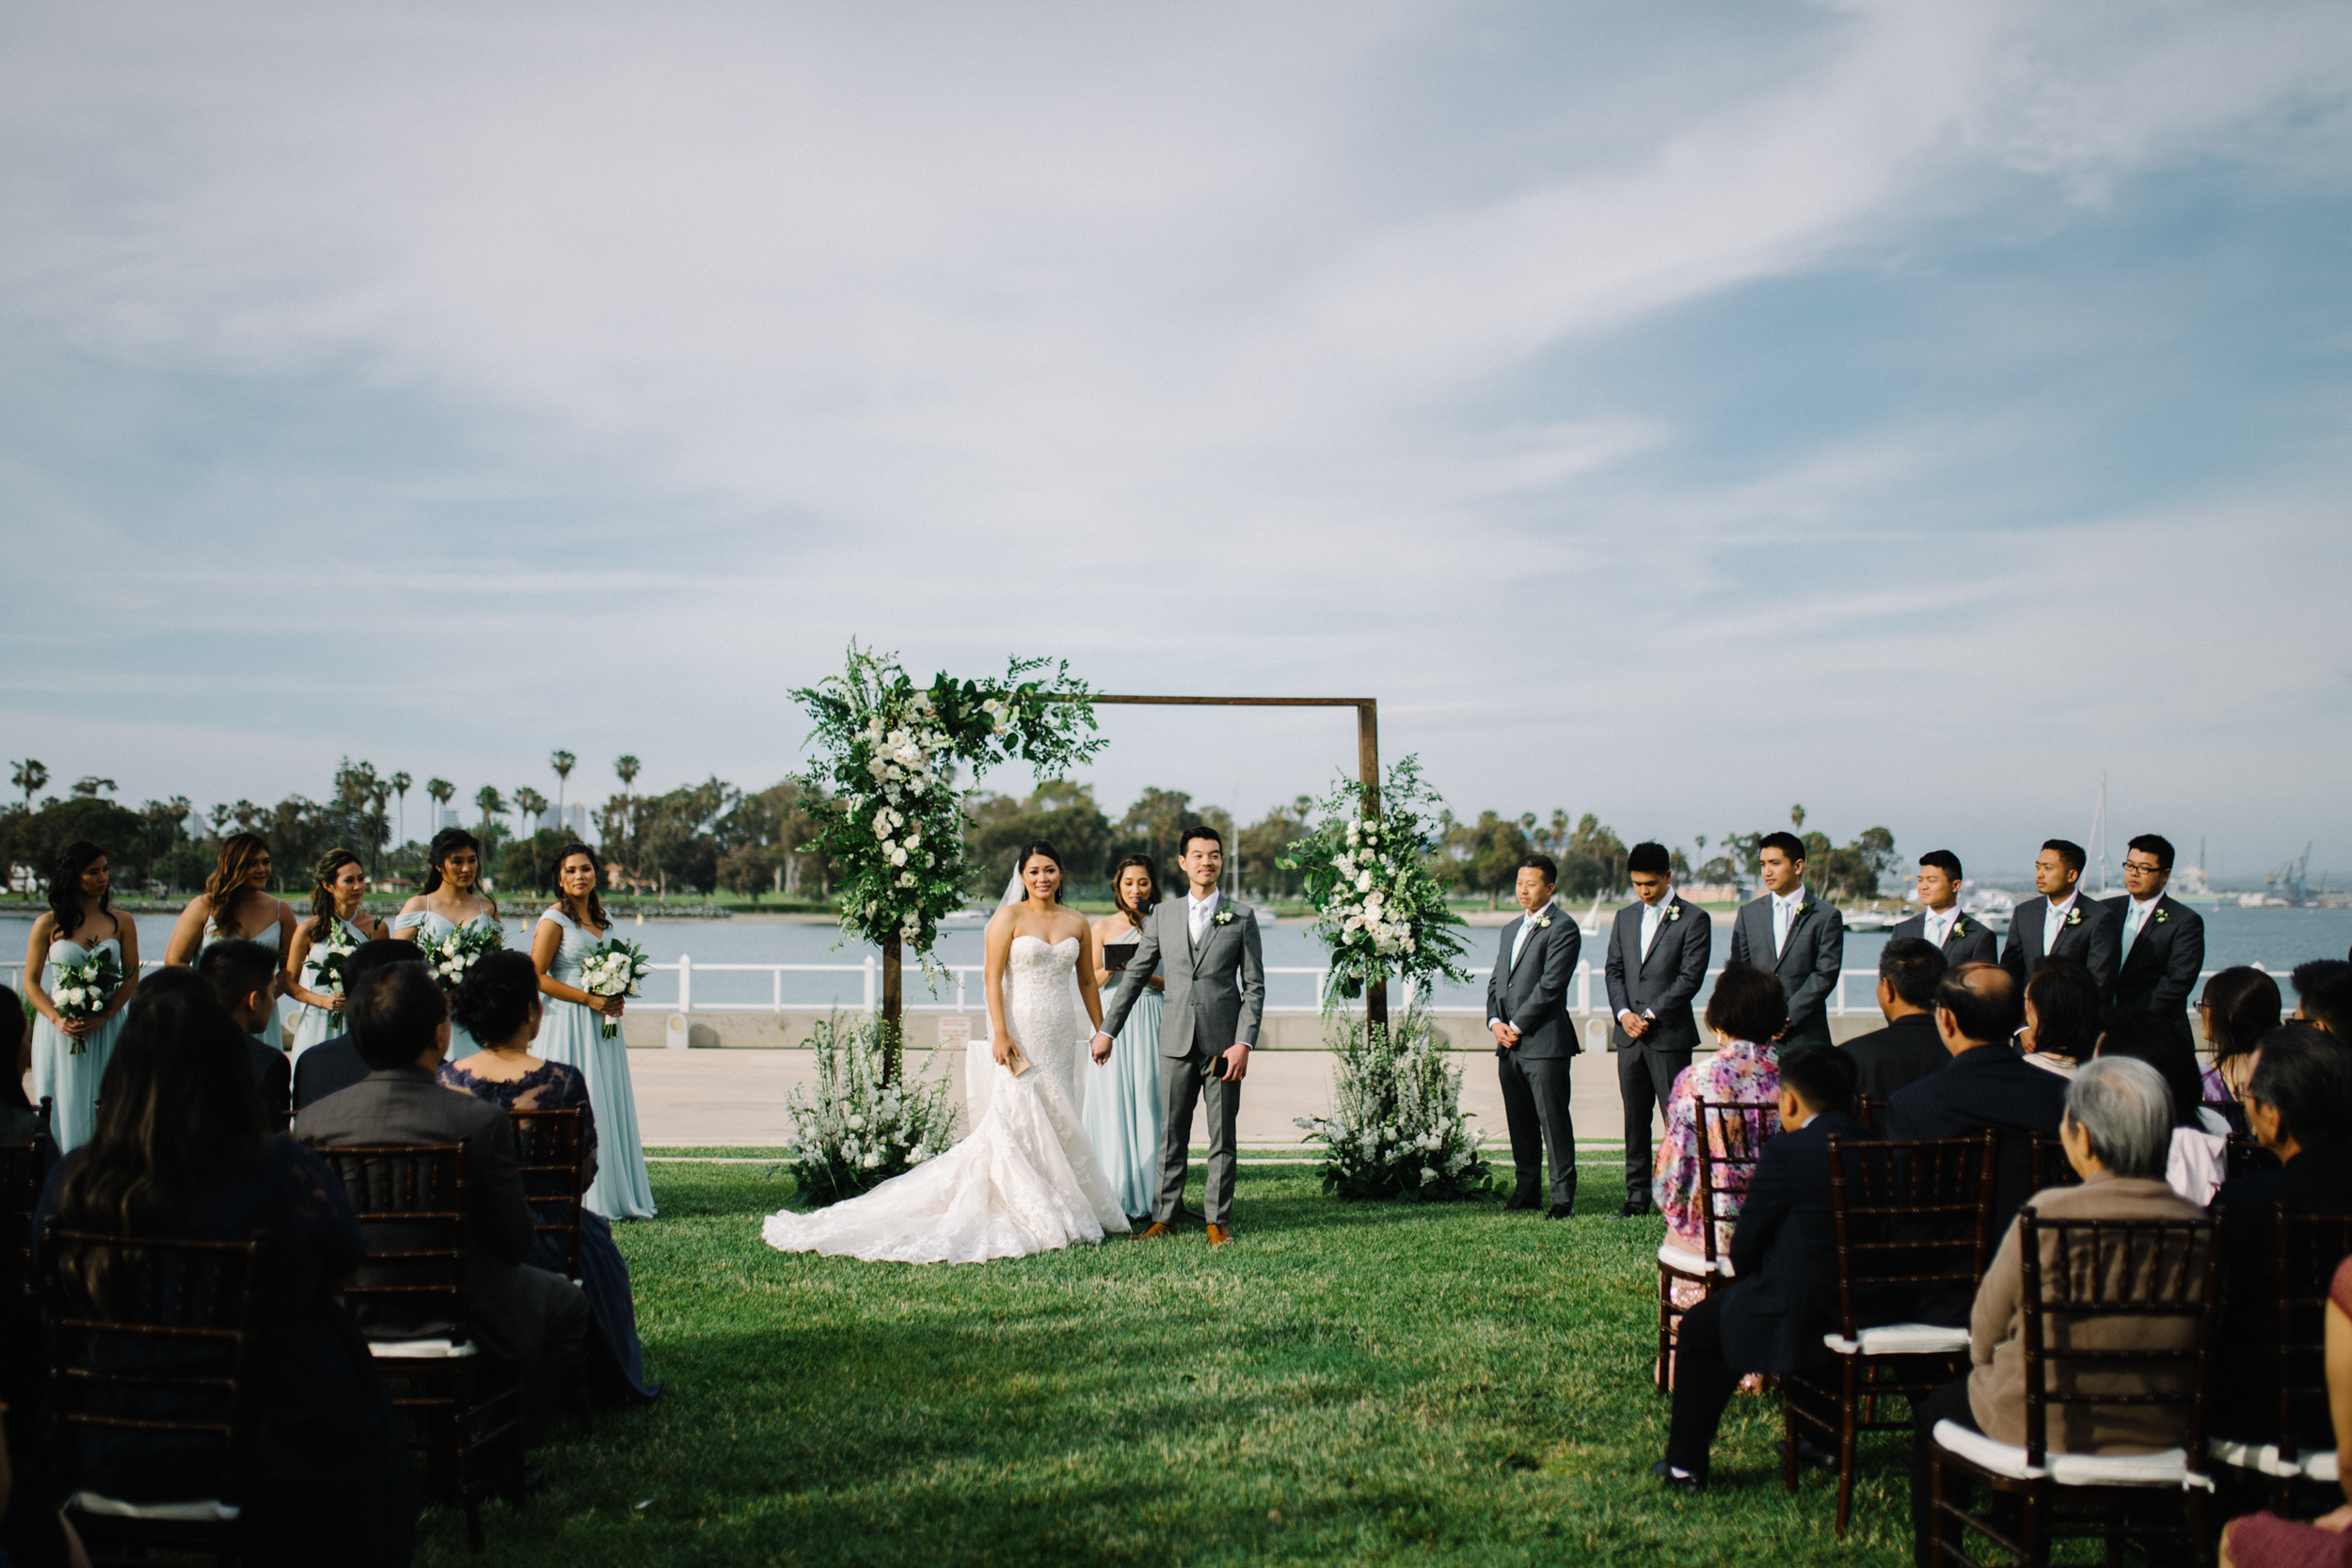 wedding_coronado_community_center-24.jpg